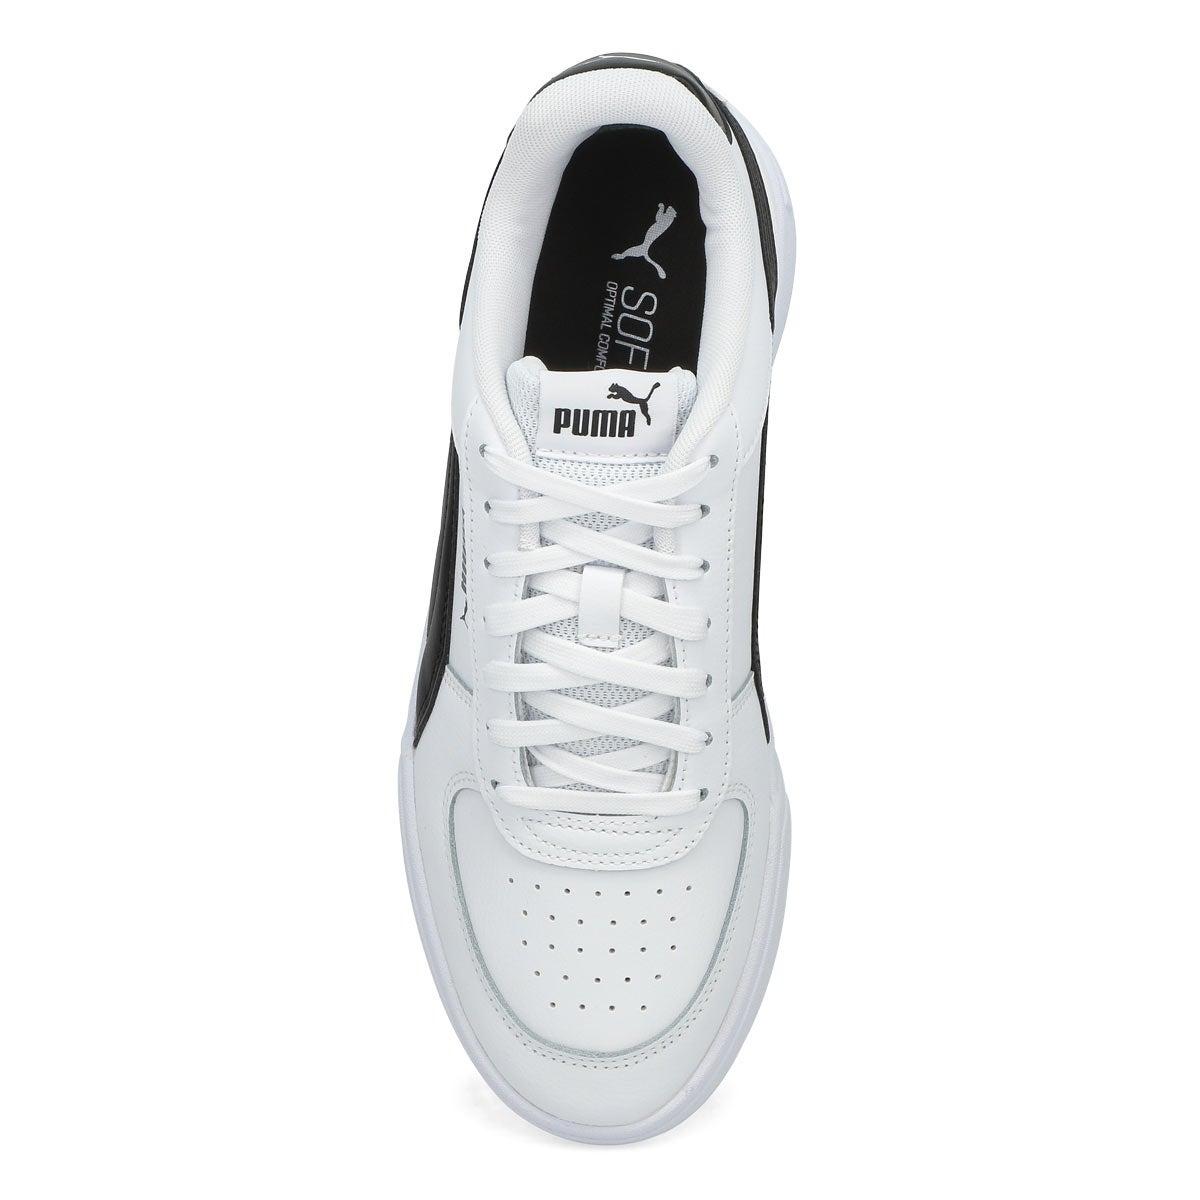 Men's Puma Caven Sneaker-White/Black